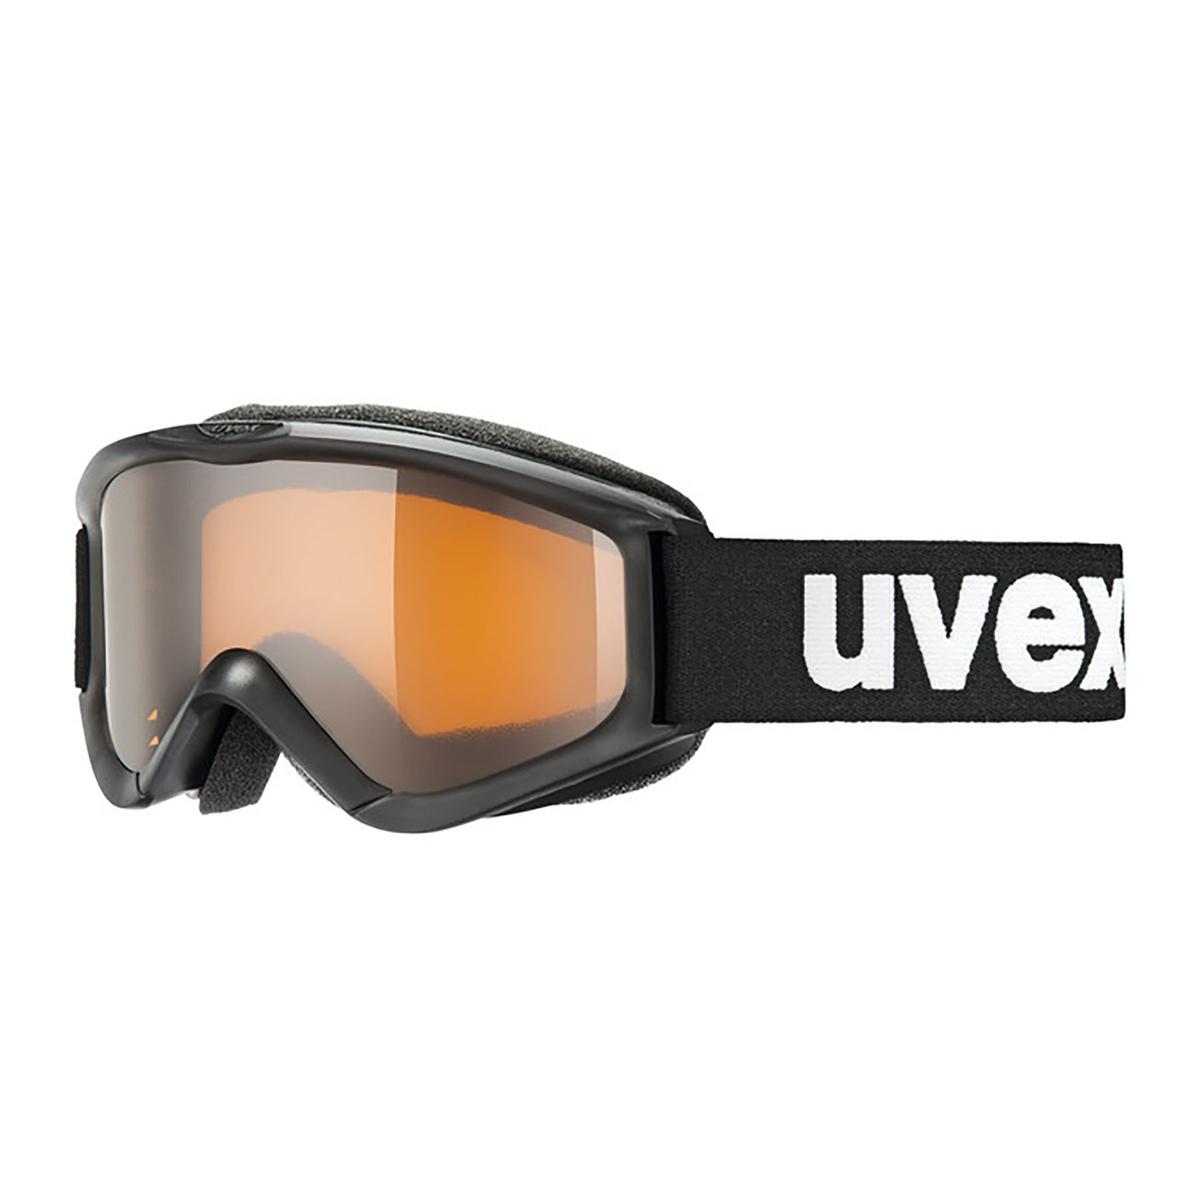 uvex maschera speedy pro bambino